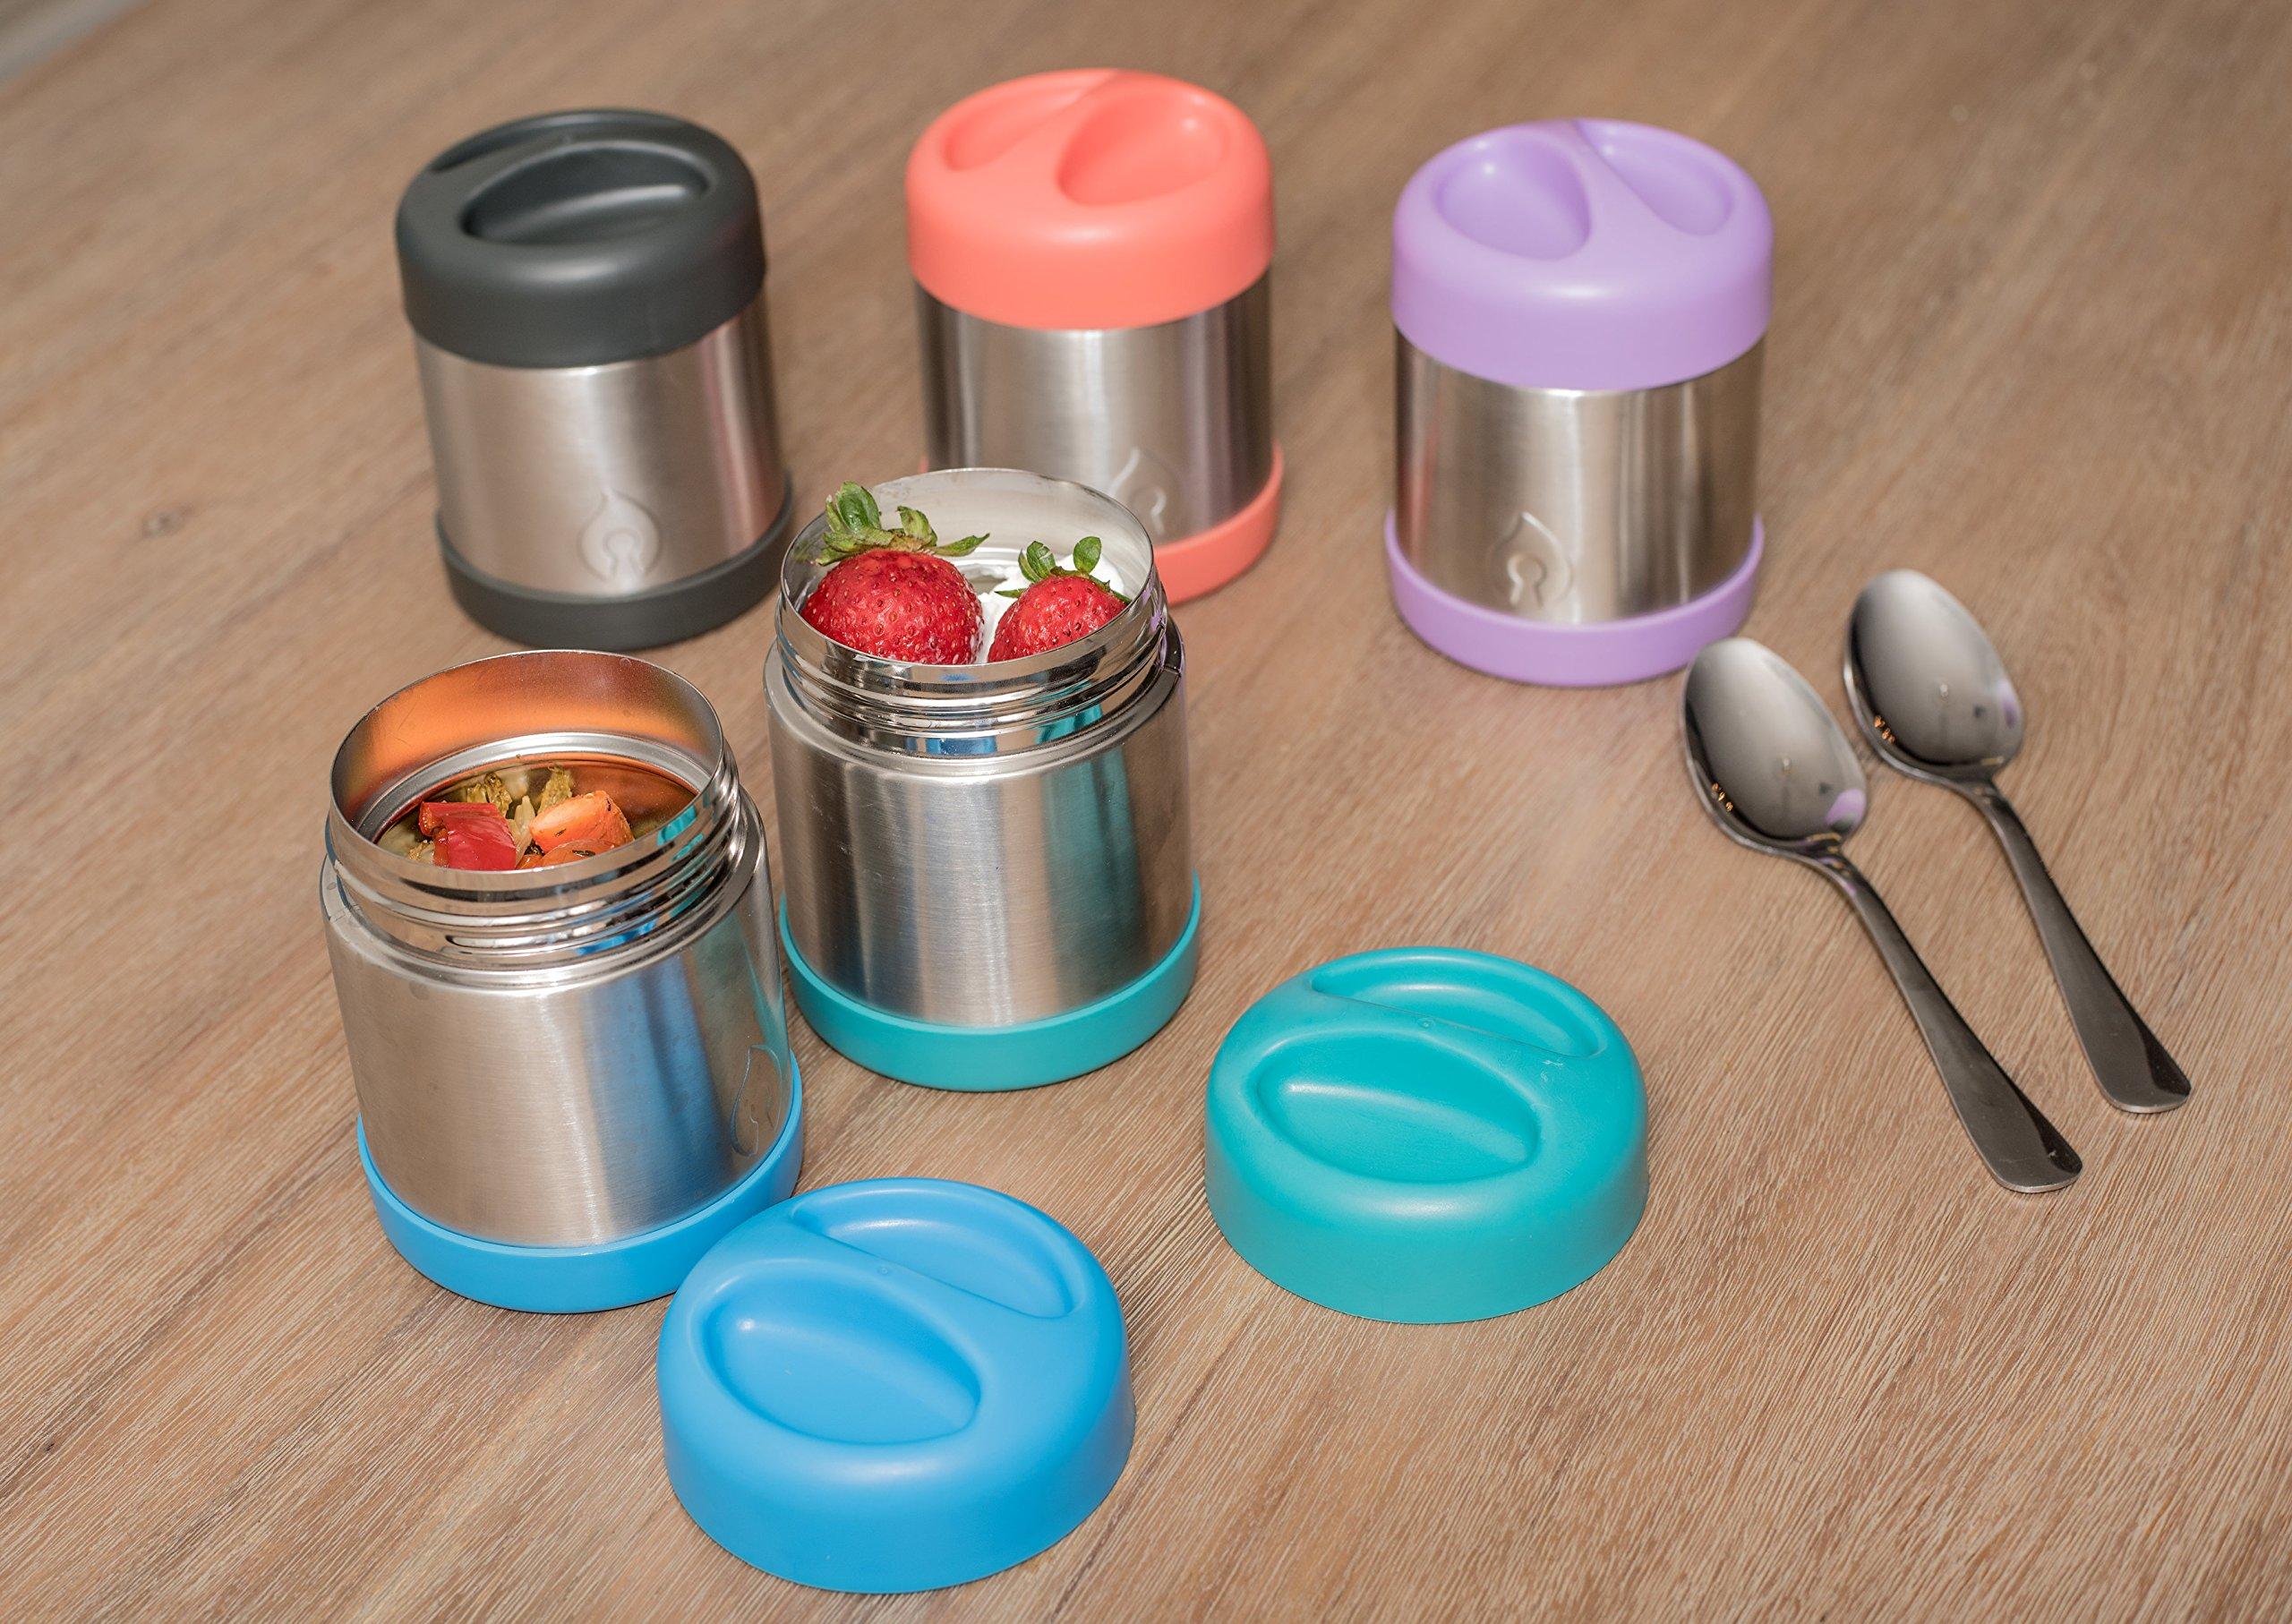 FIREKI 10 oz Food Canister | Vacuum Insulated Food Jar (Lime Green)